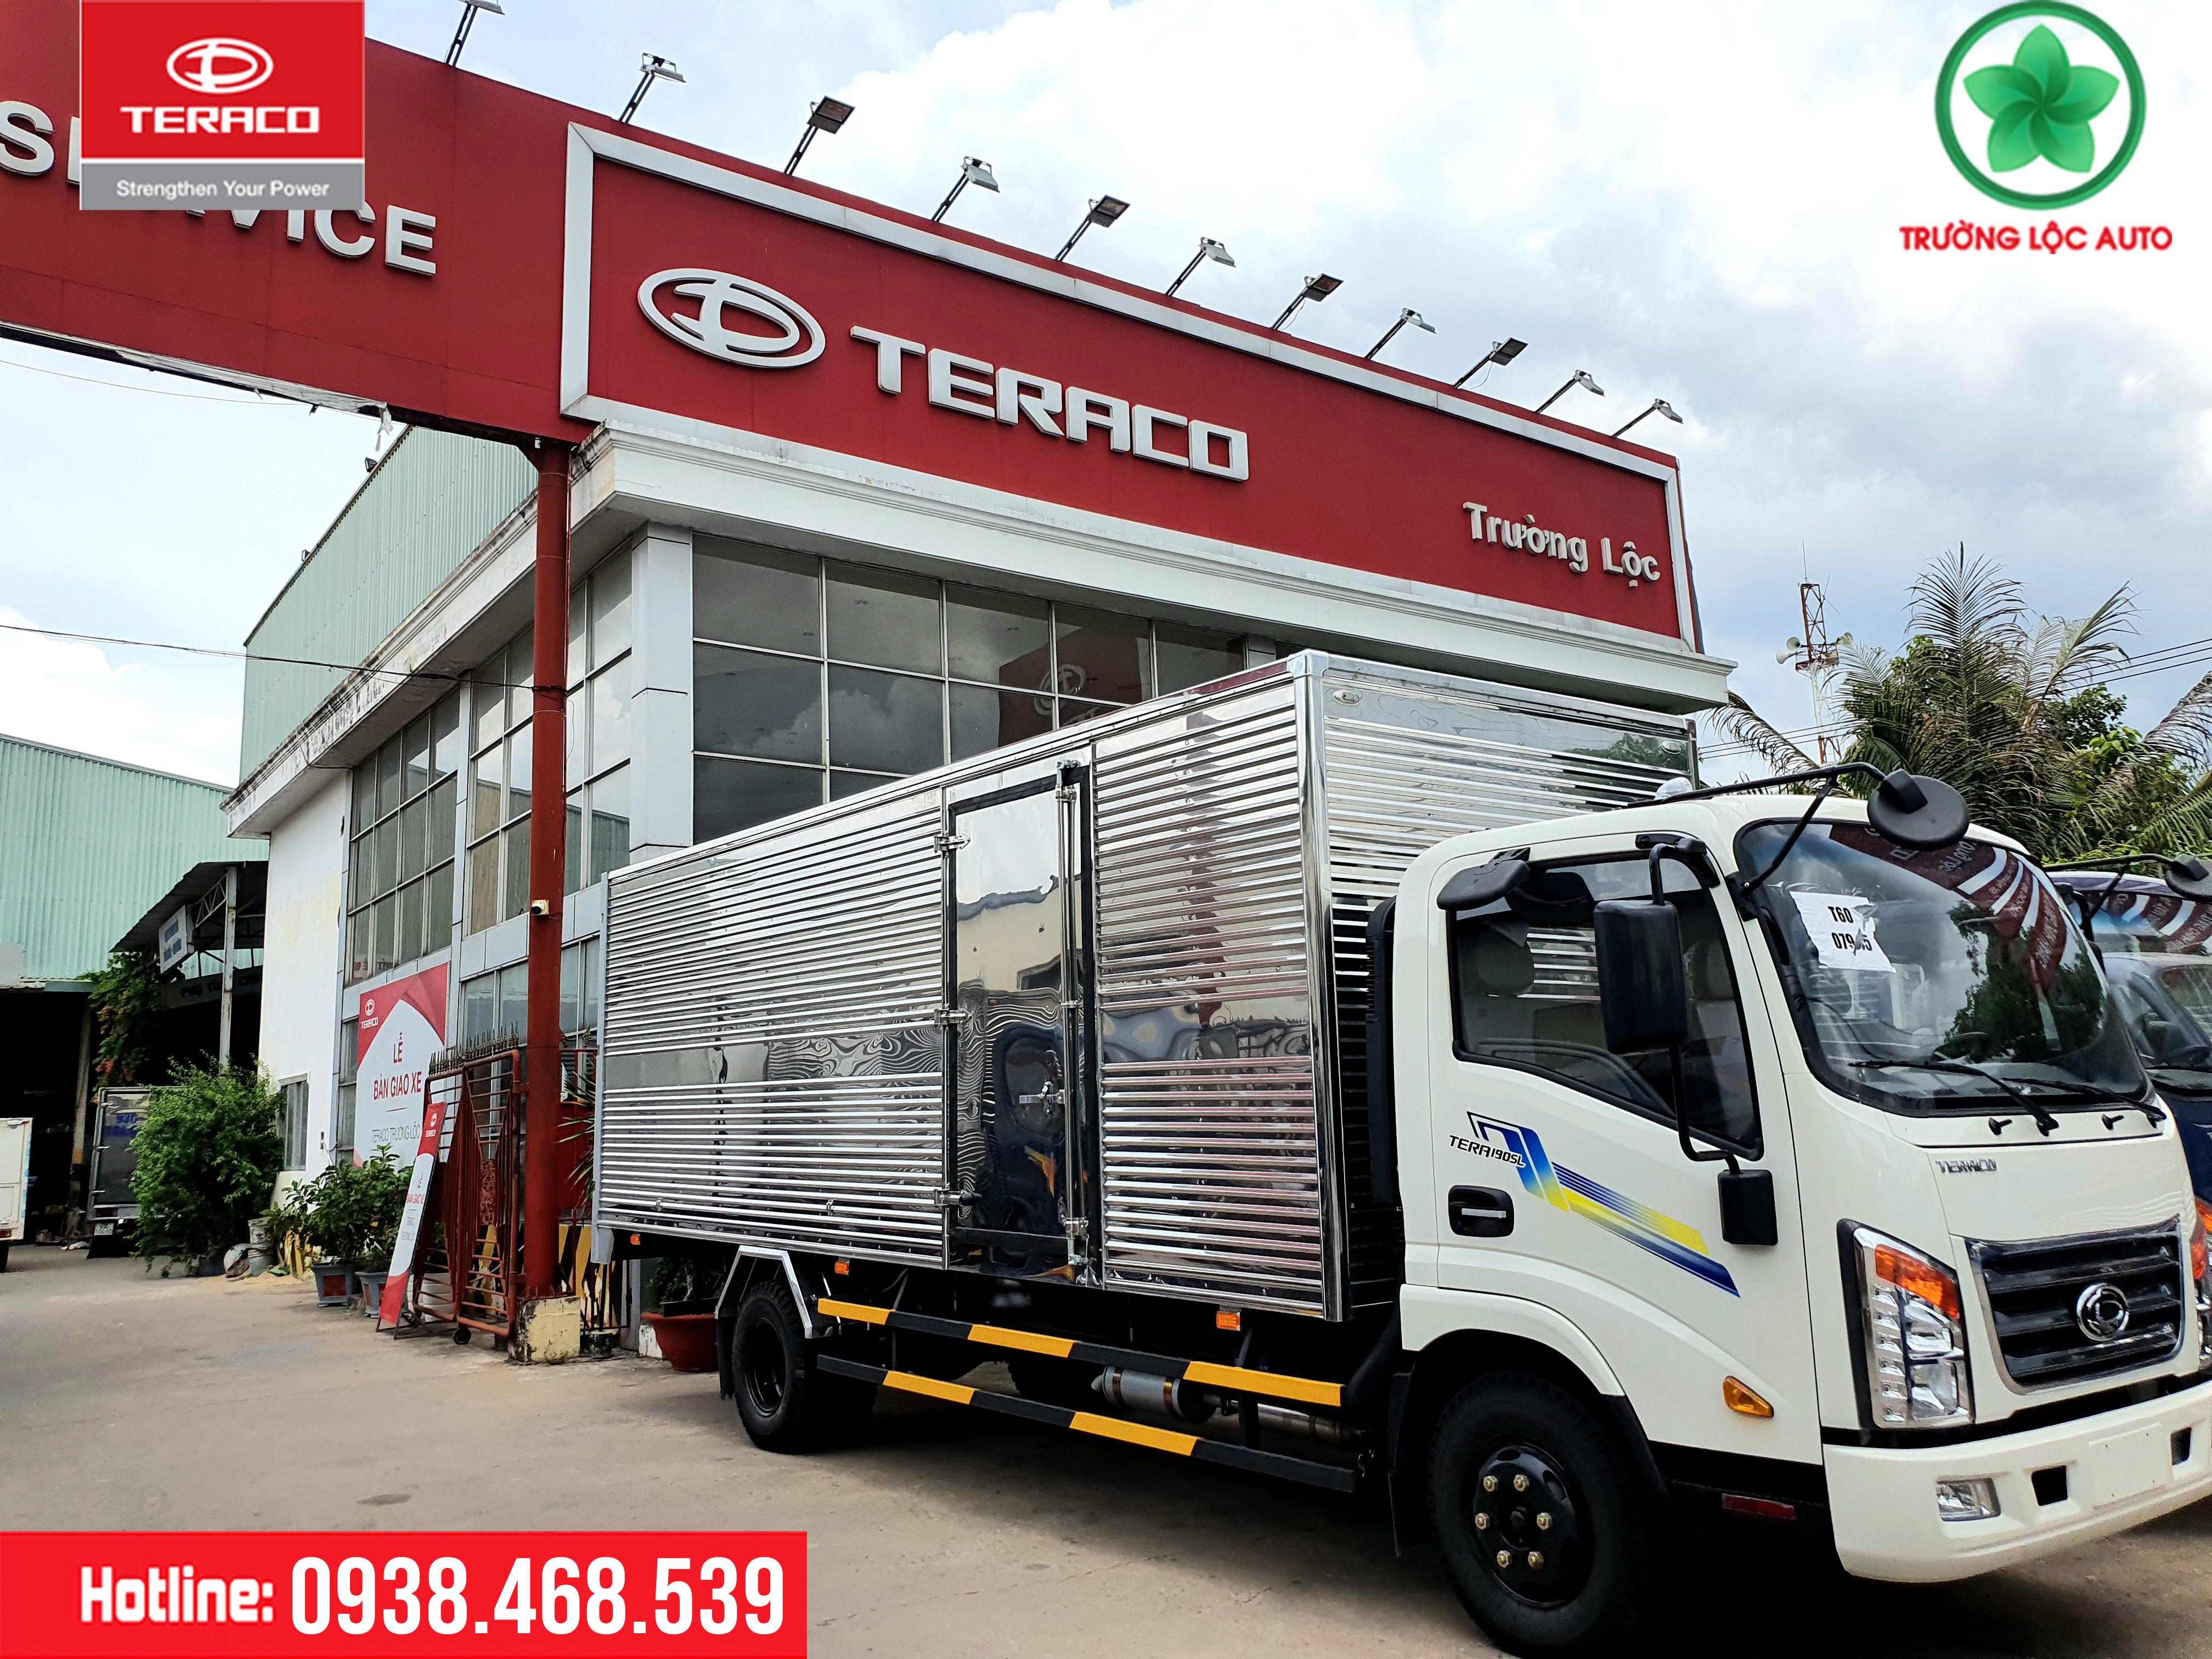 giá xe tải tera 190SL